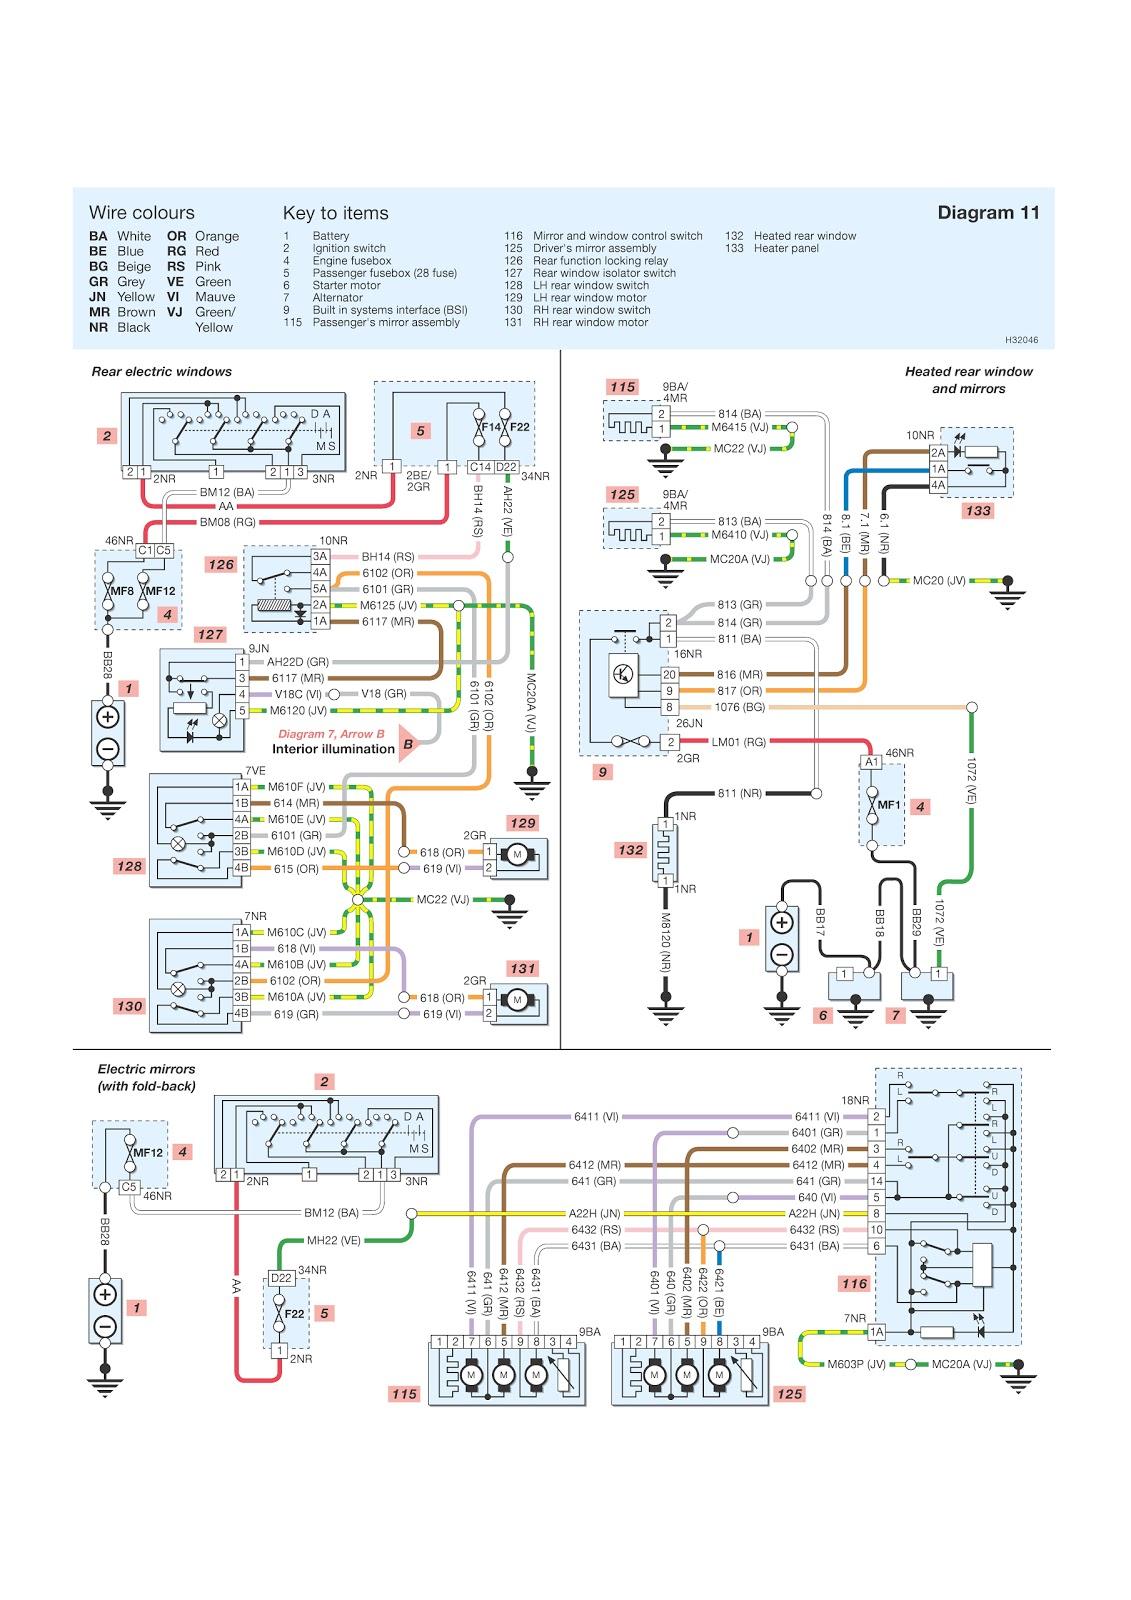 2008 vw pat fuse box diagram vw fuse block wiring diagram